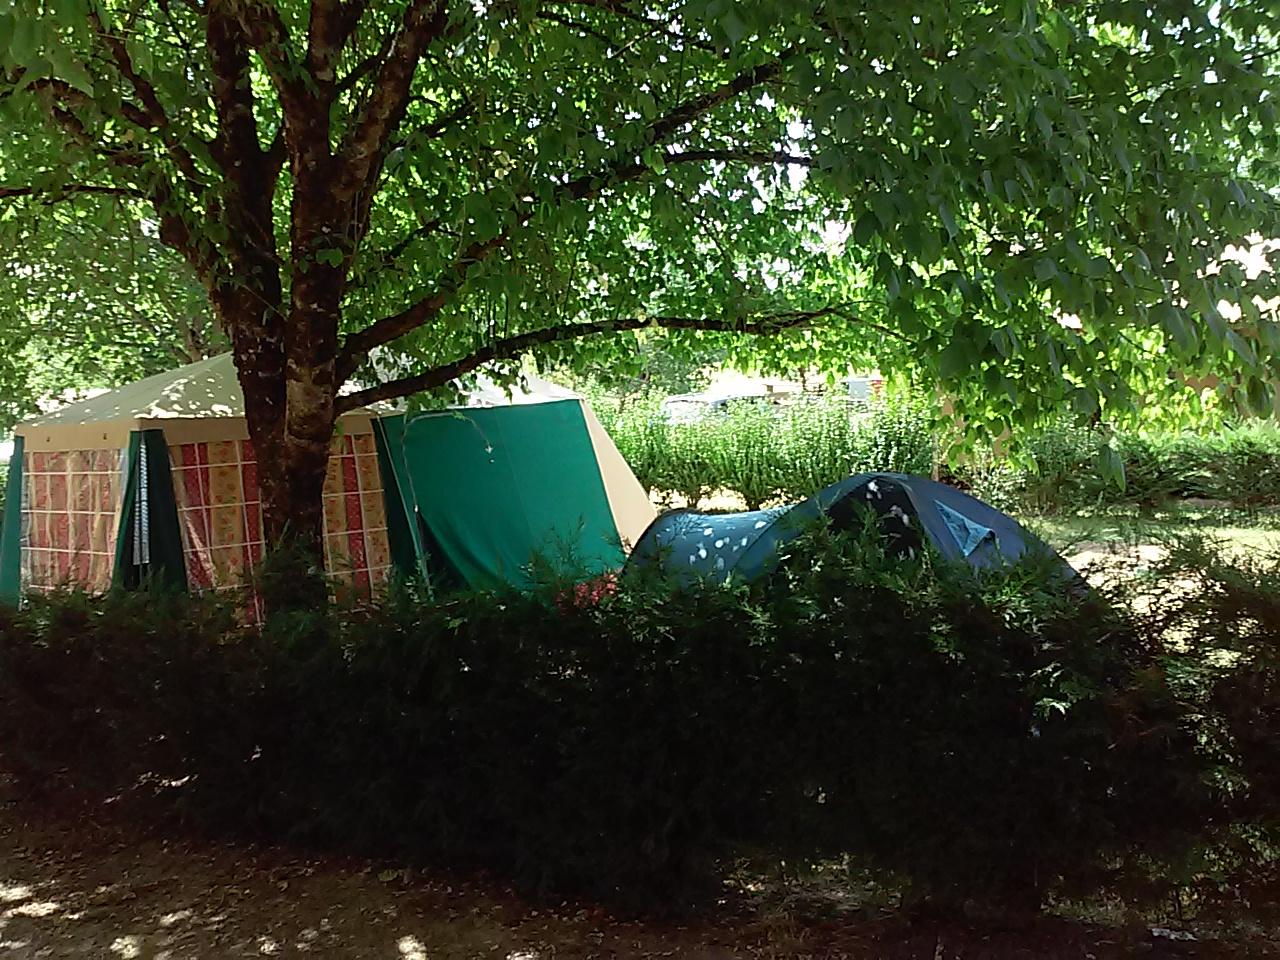 Aire camping car dordogne camping grand emplacement tente camping dordogne 4 toiles for Camping dordogne avec piscine pas cher